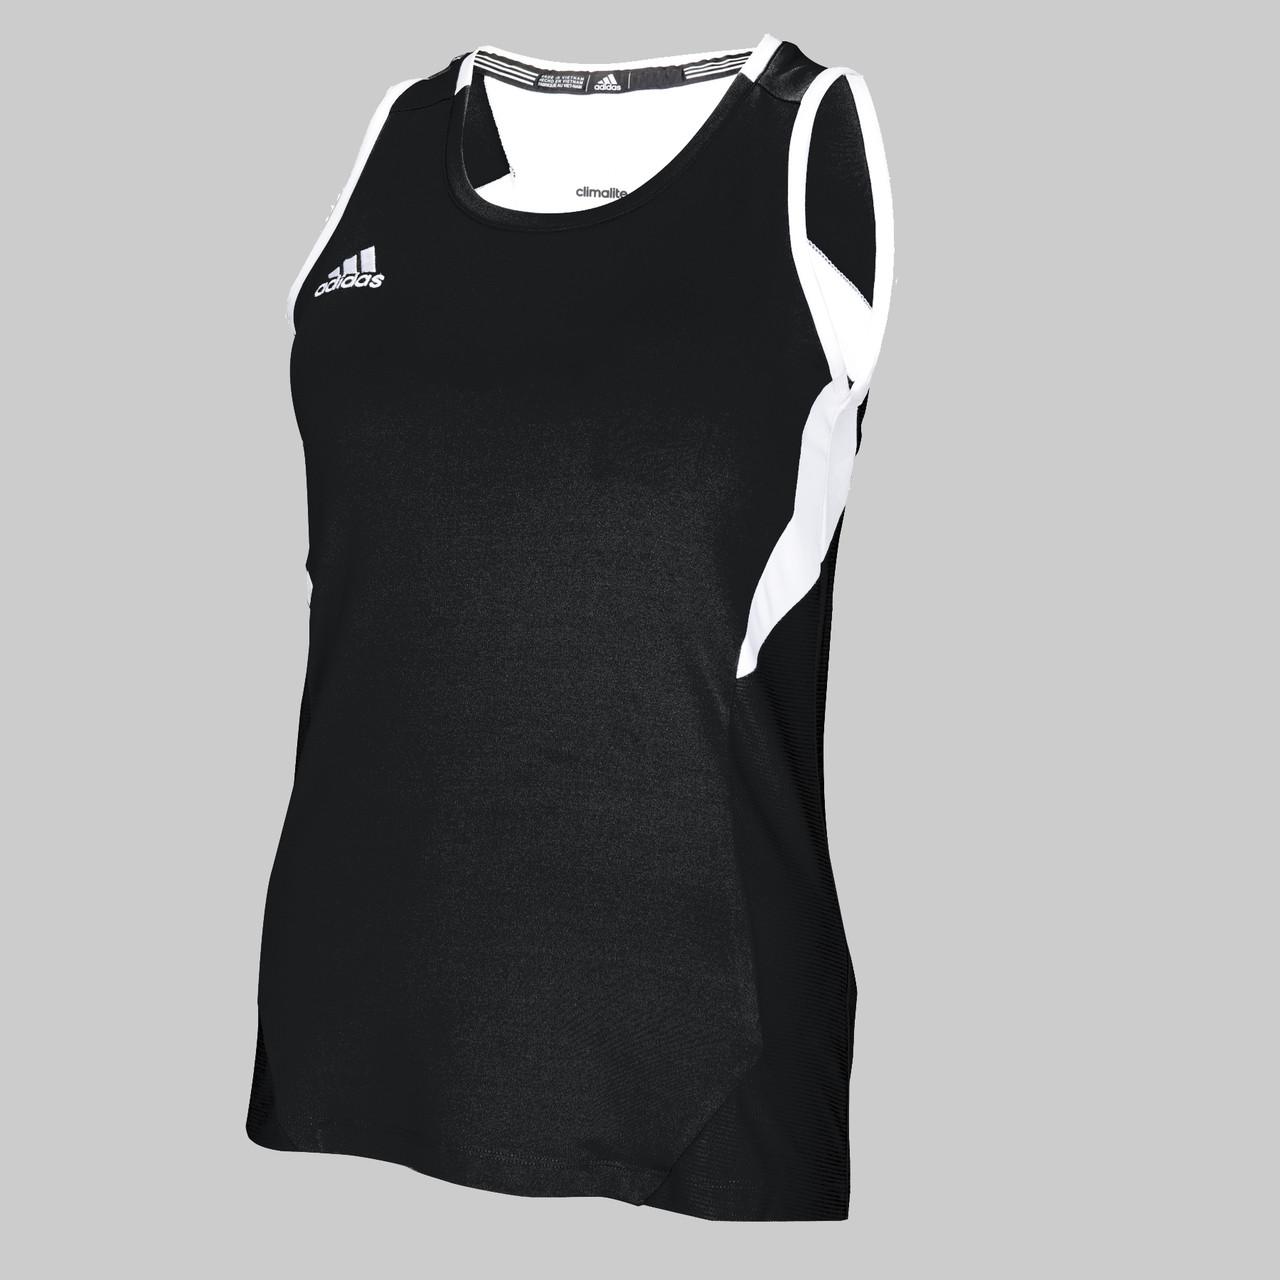 4c609362f3c ... Adidas Women's Utility Athletic Tank Top - Black, ...